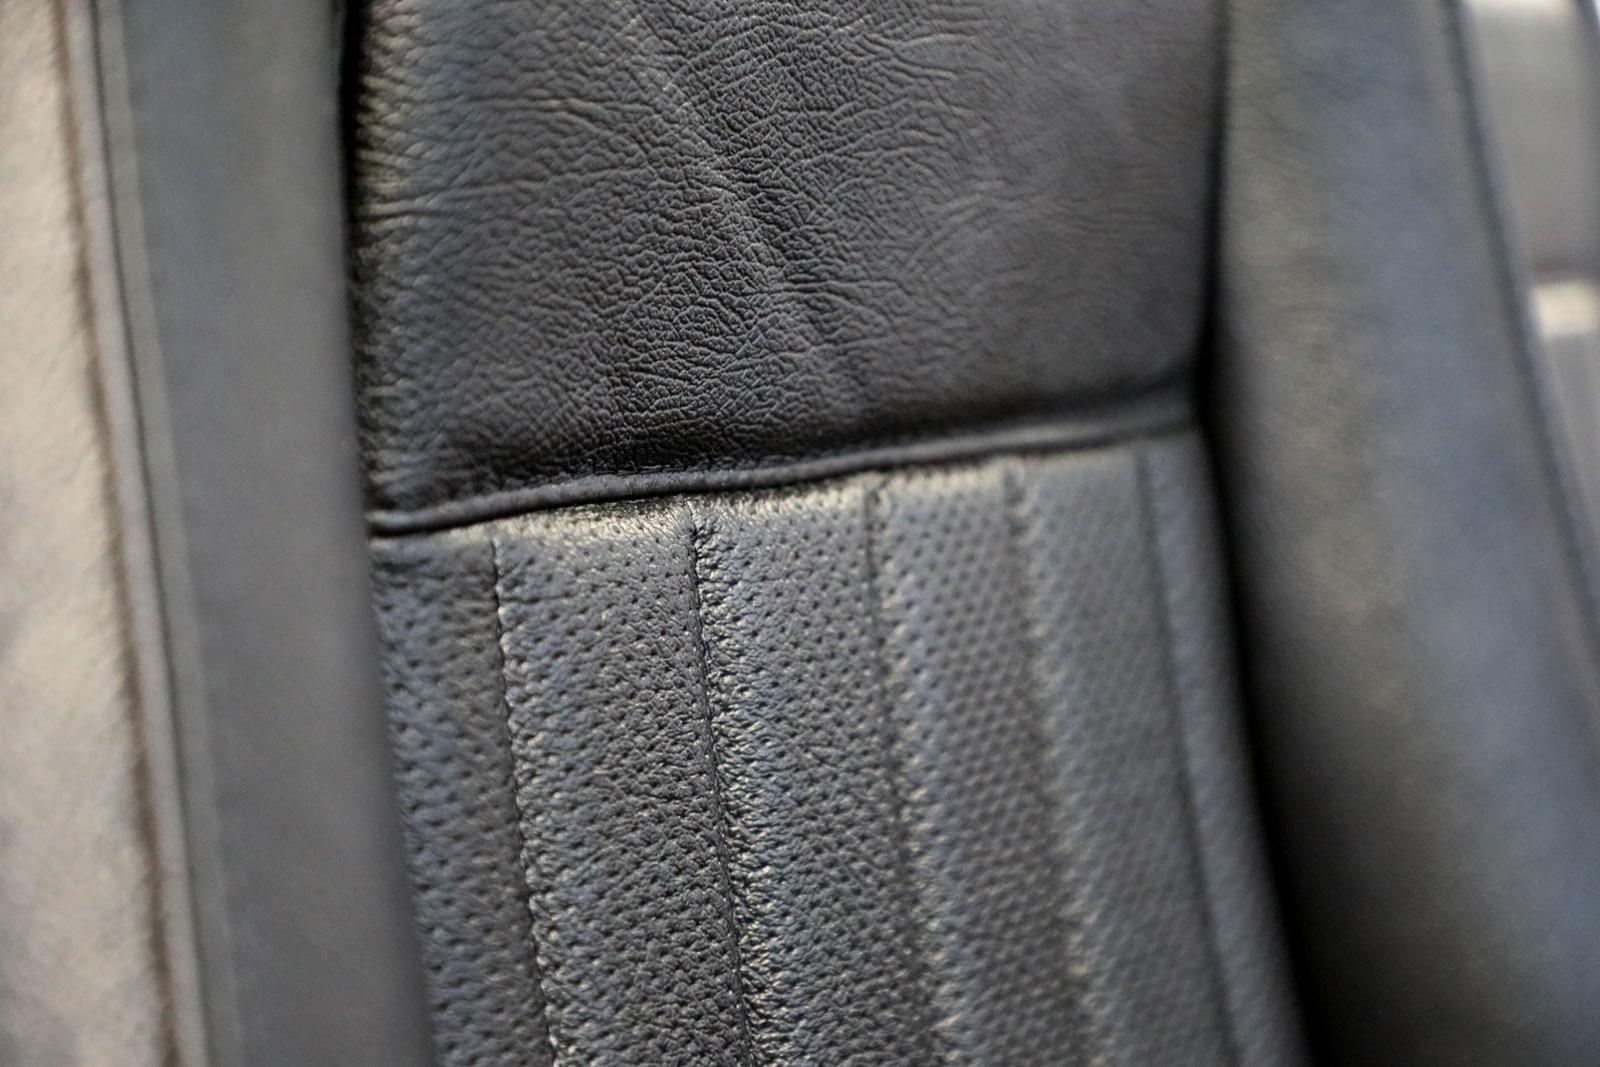 Sattlerei K.M. Lederdesign, Polsterer, Recaro Sitze vorn Sattlerei Autositze beziehen Naht